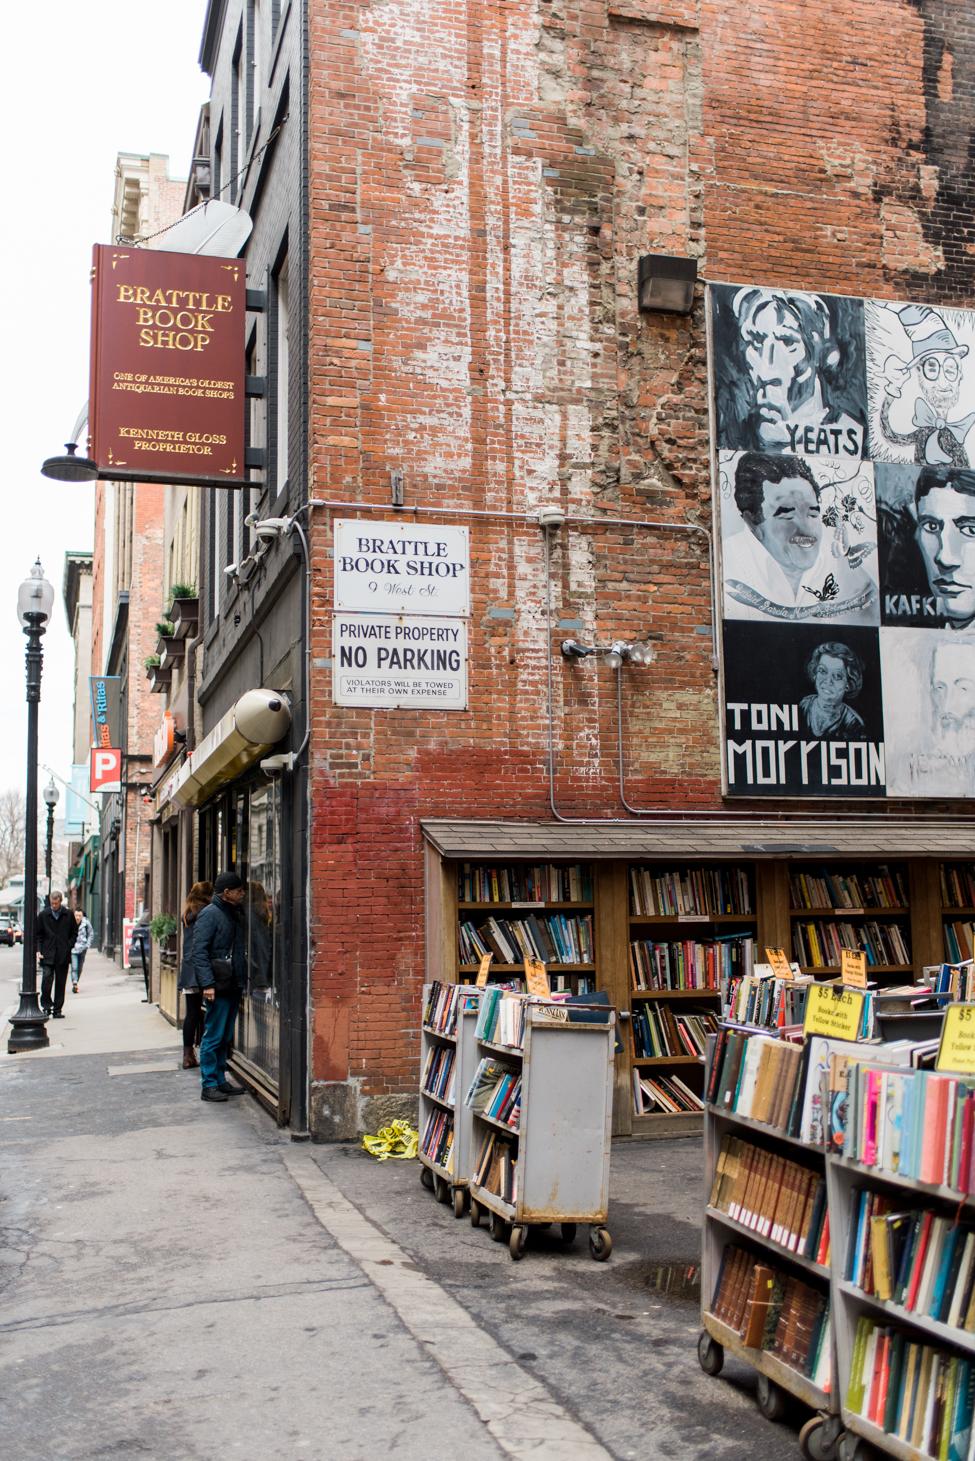 white-quill-creative-brattle-book-shop-boston-massachusetts